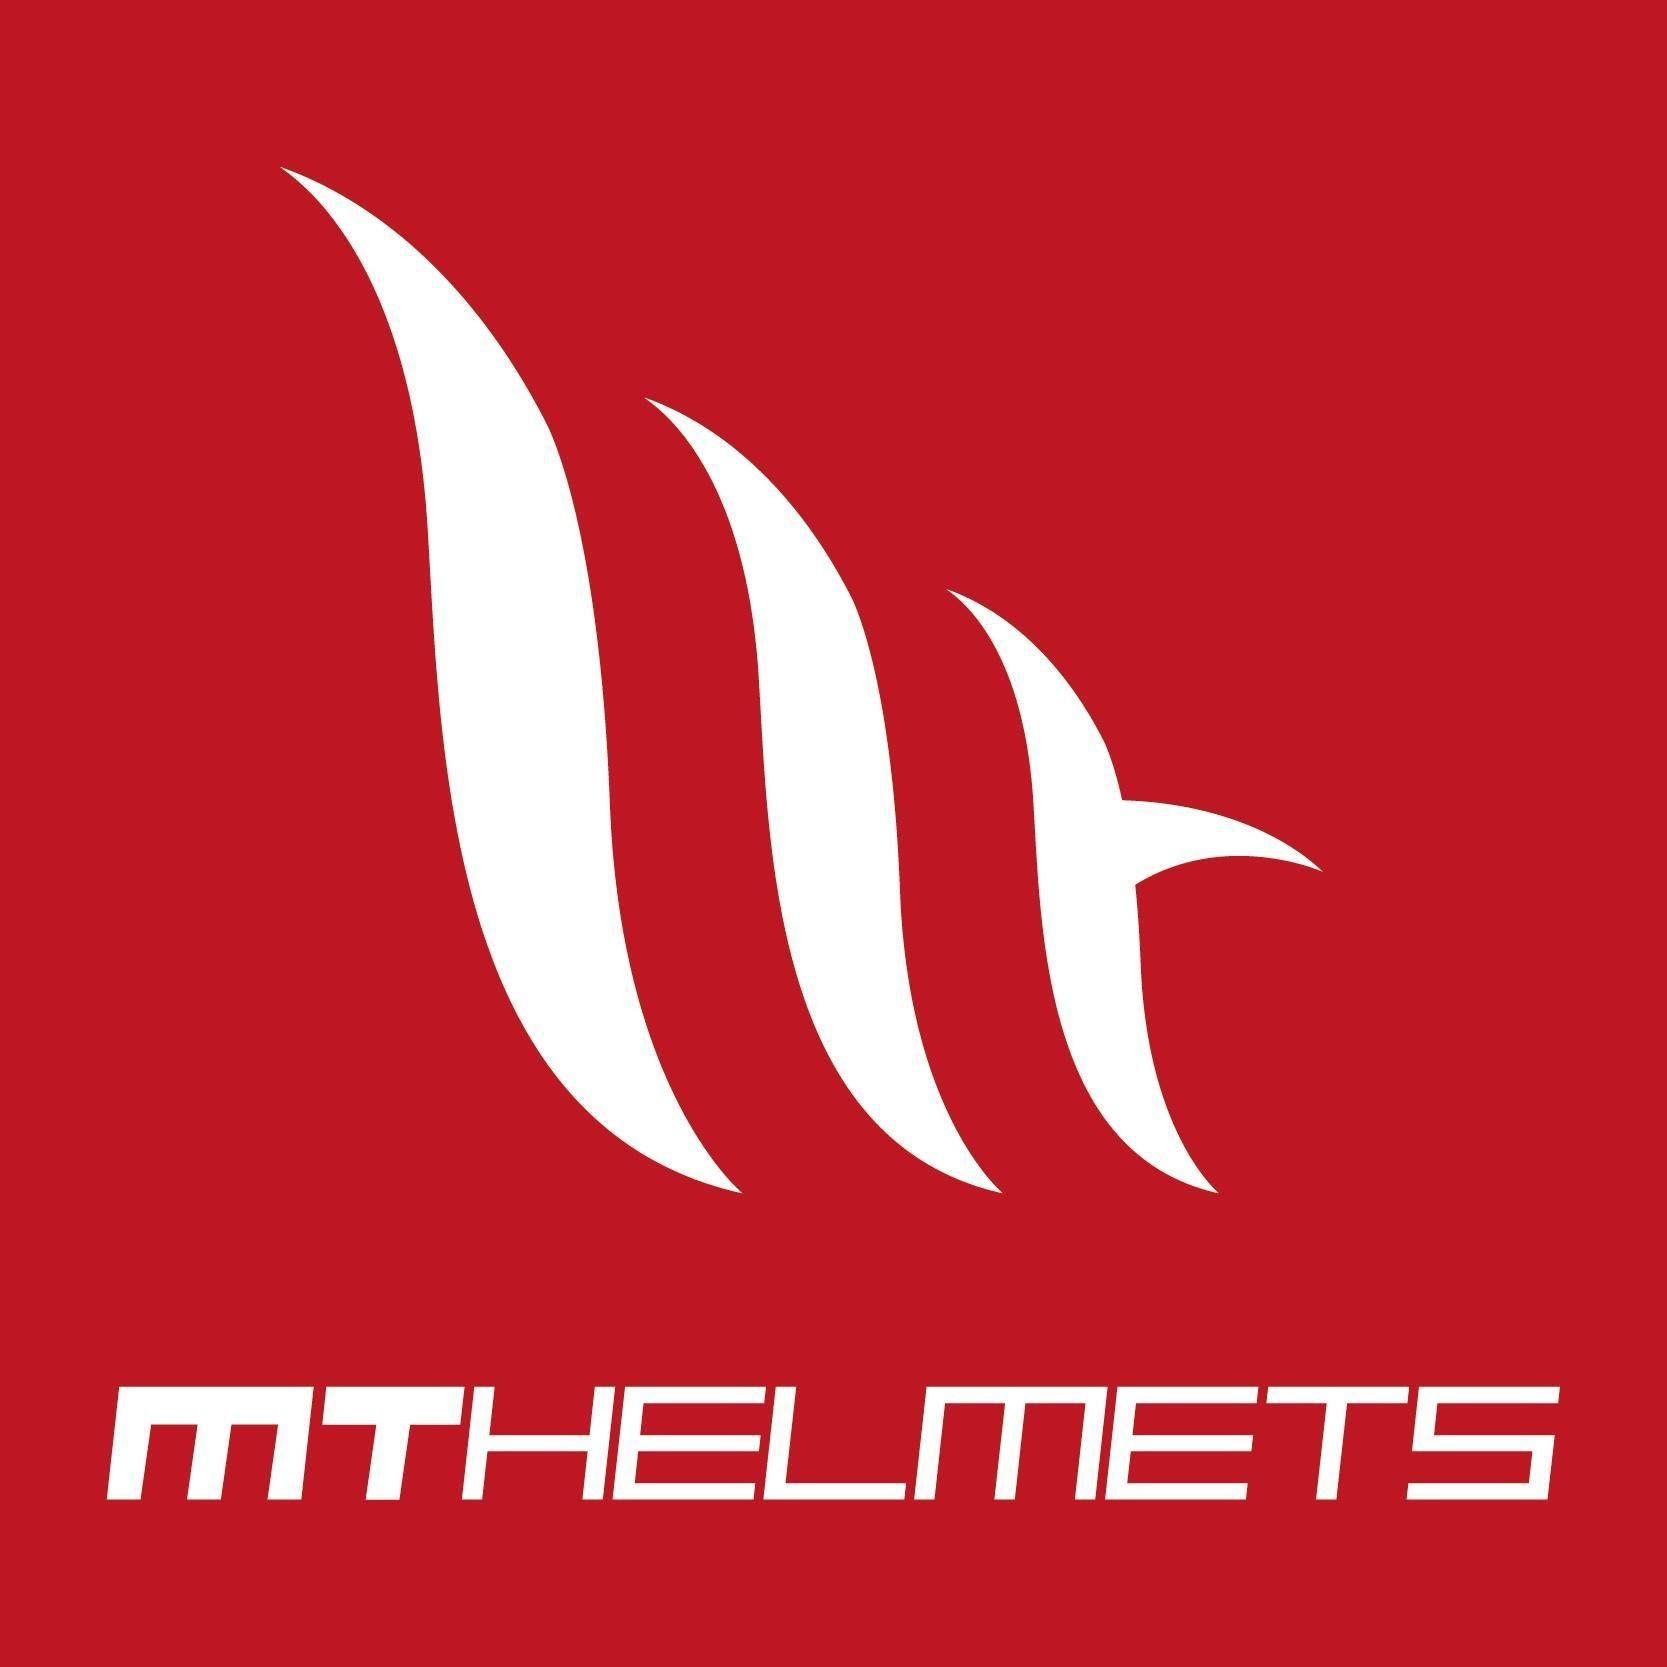 MT HELMETS